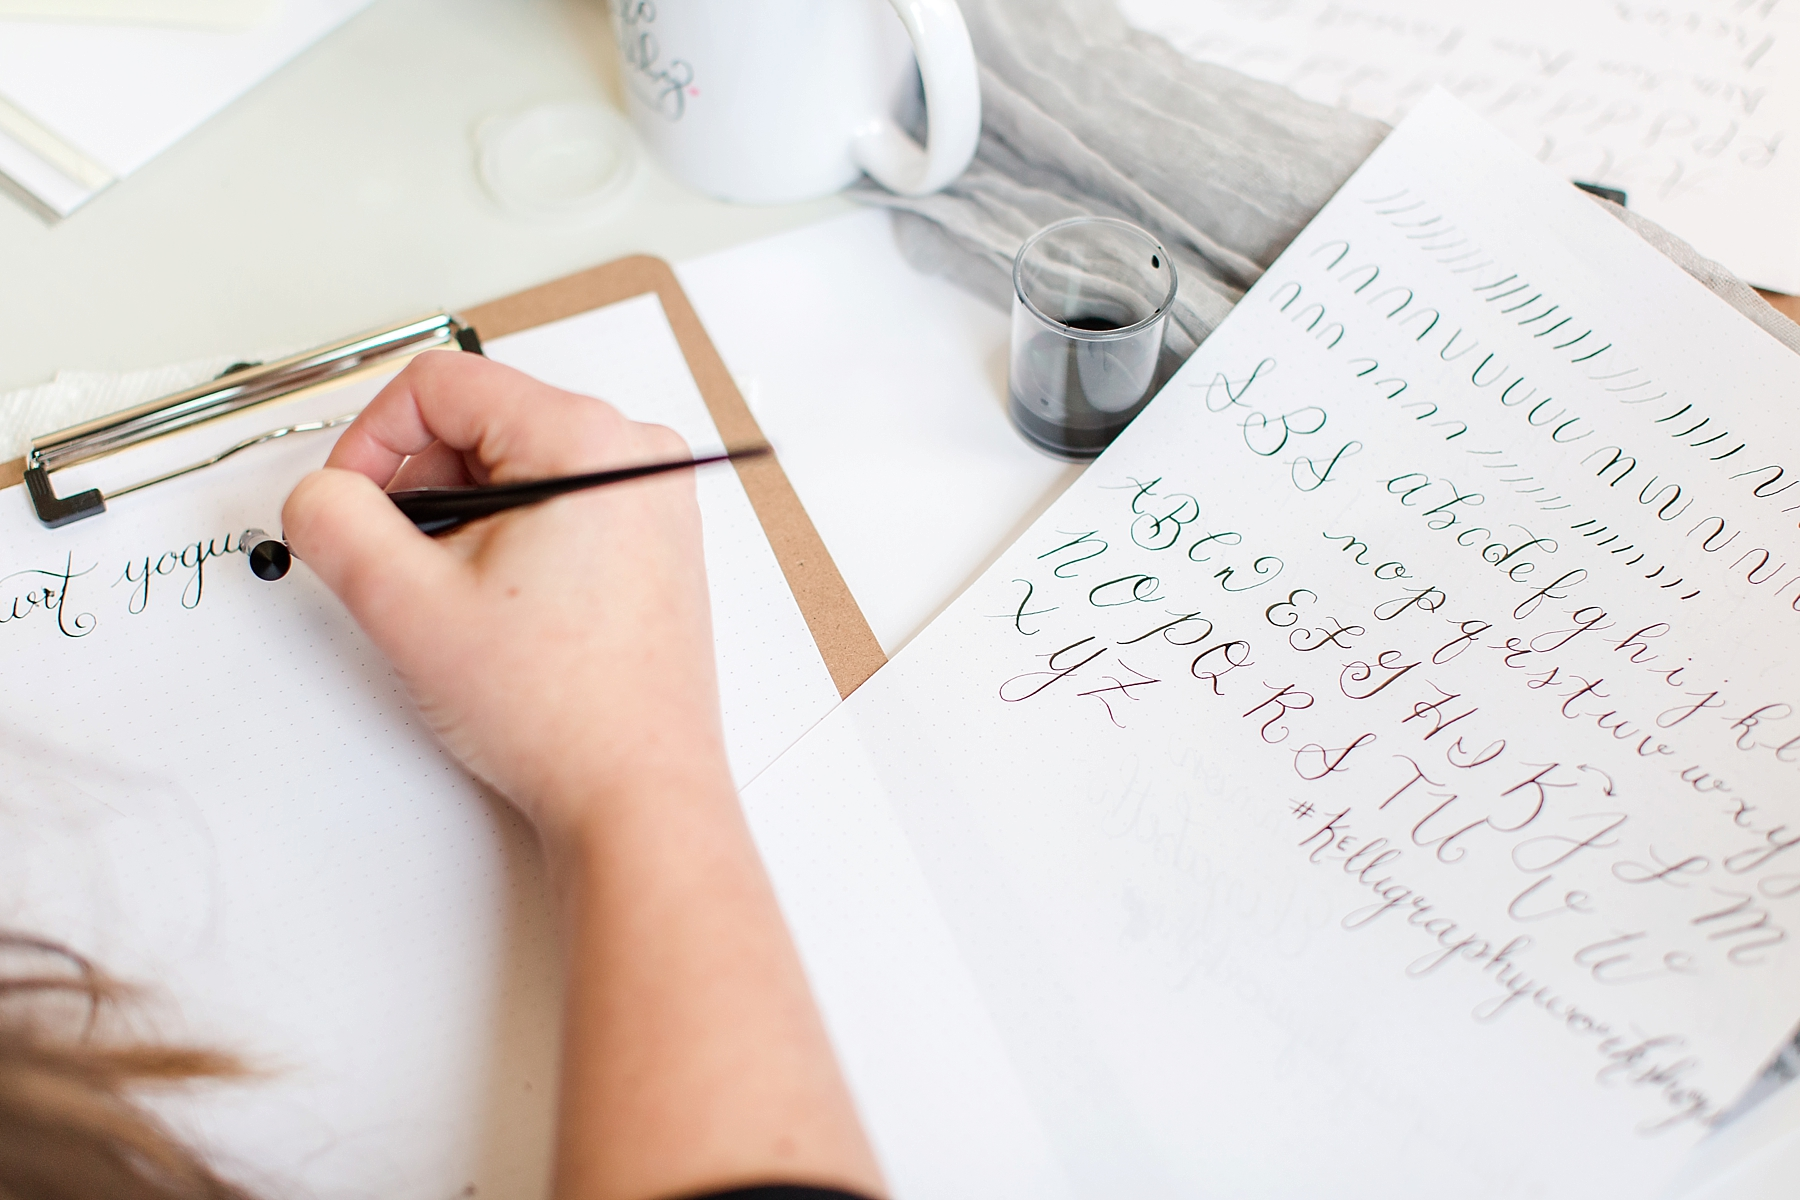 seattle-calligraphy-workshop_0010.jpg